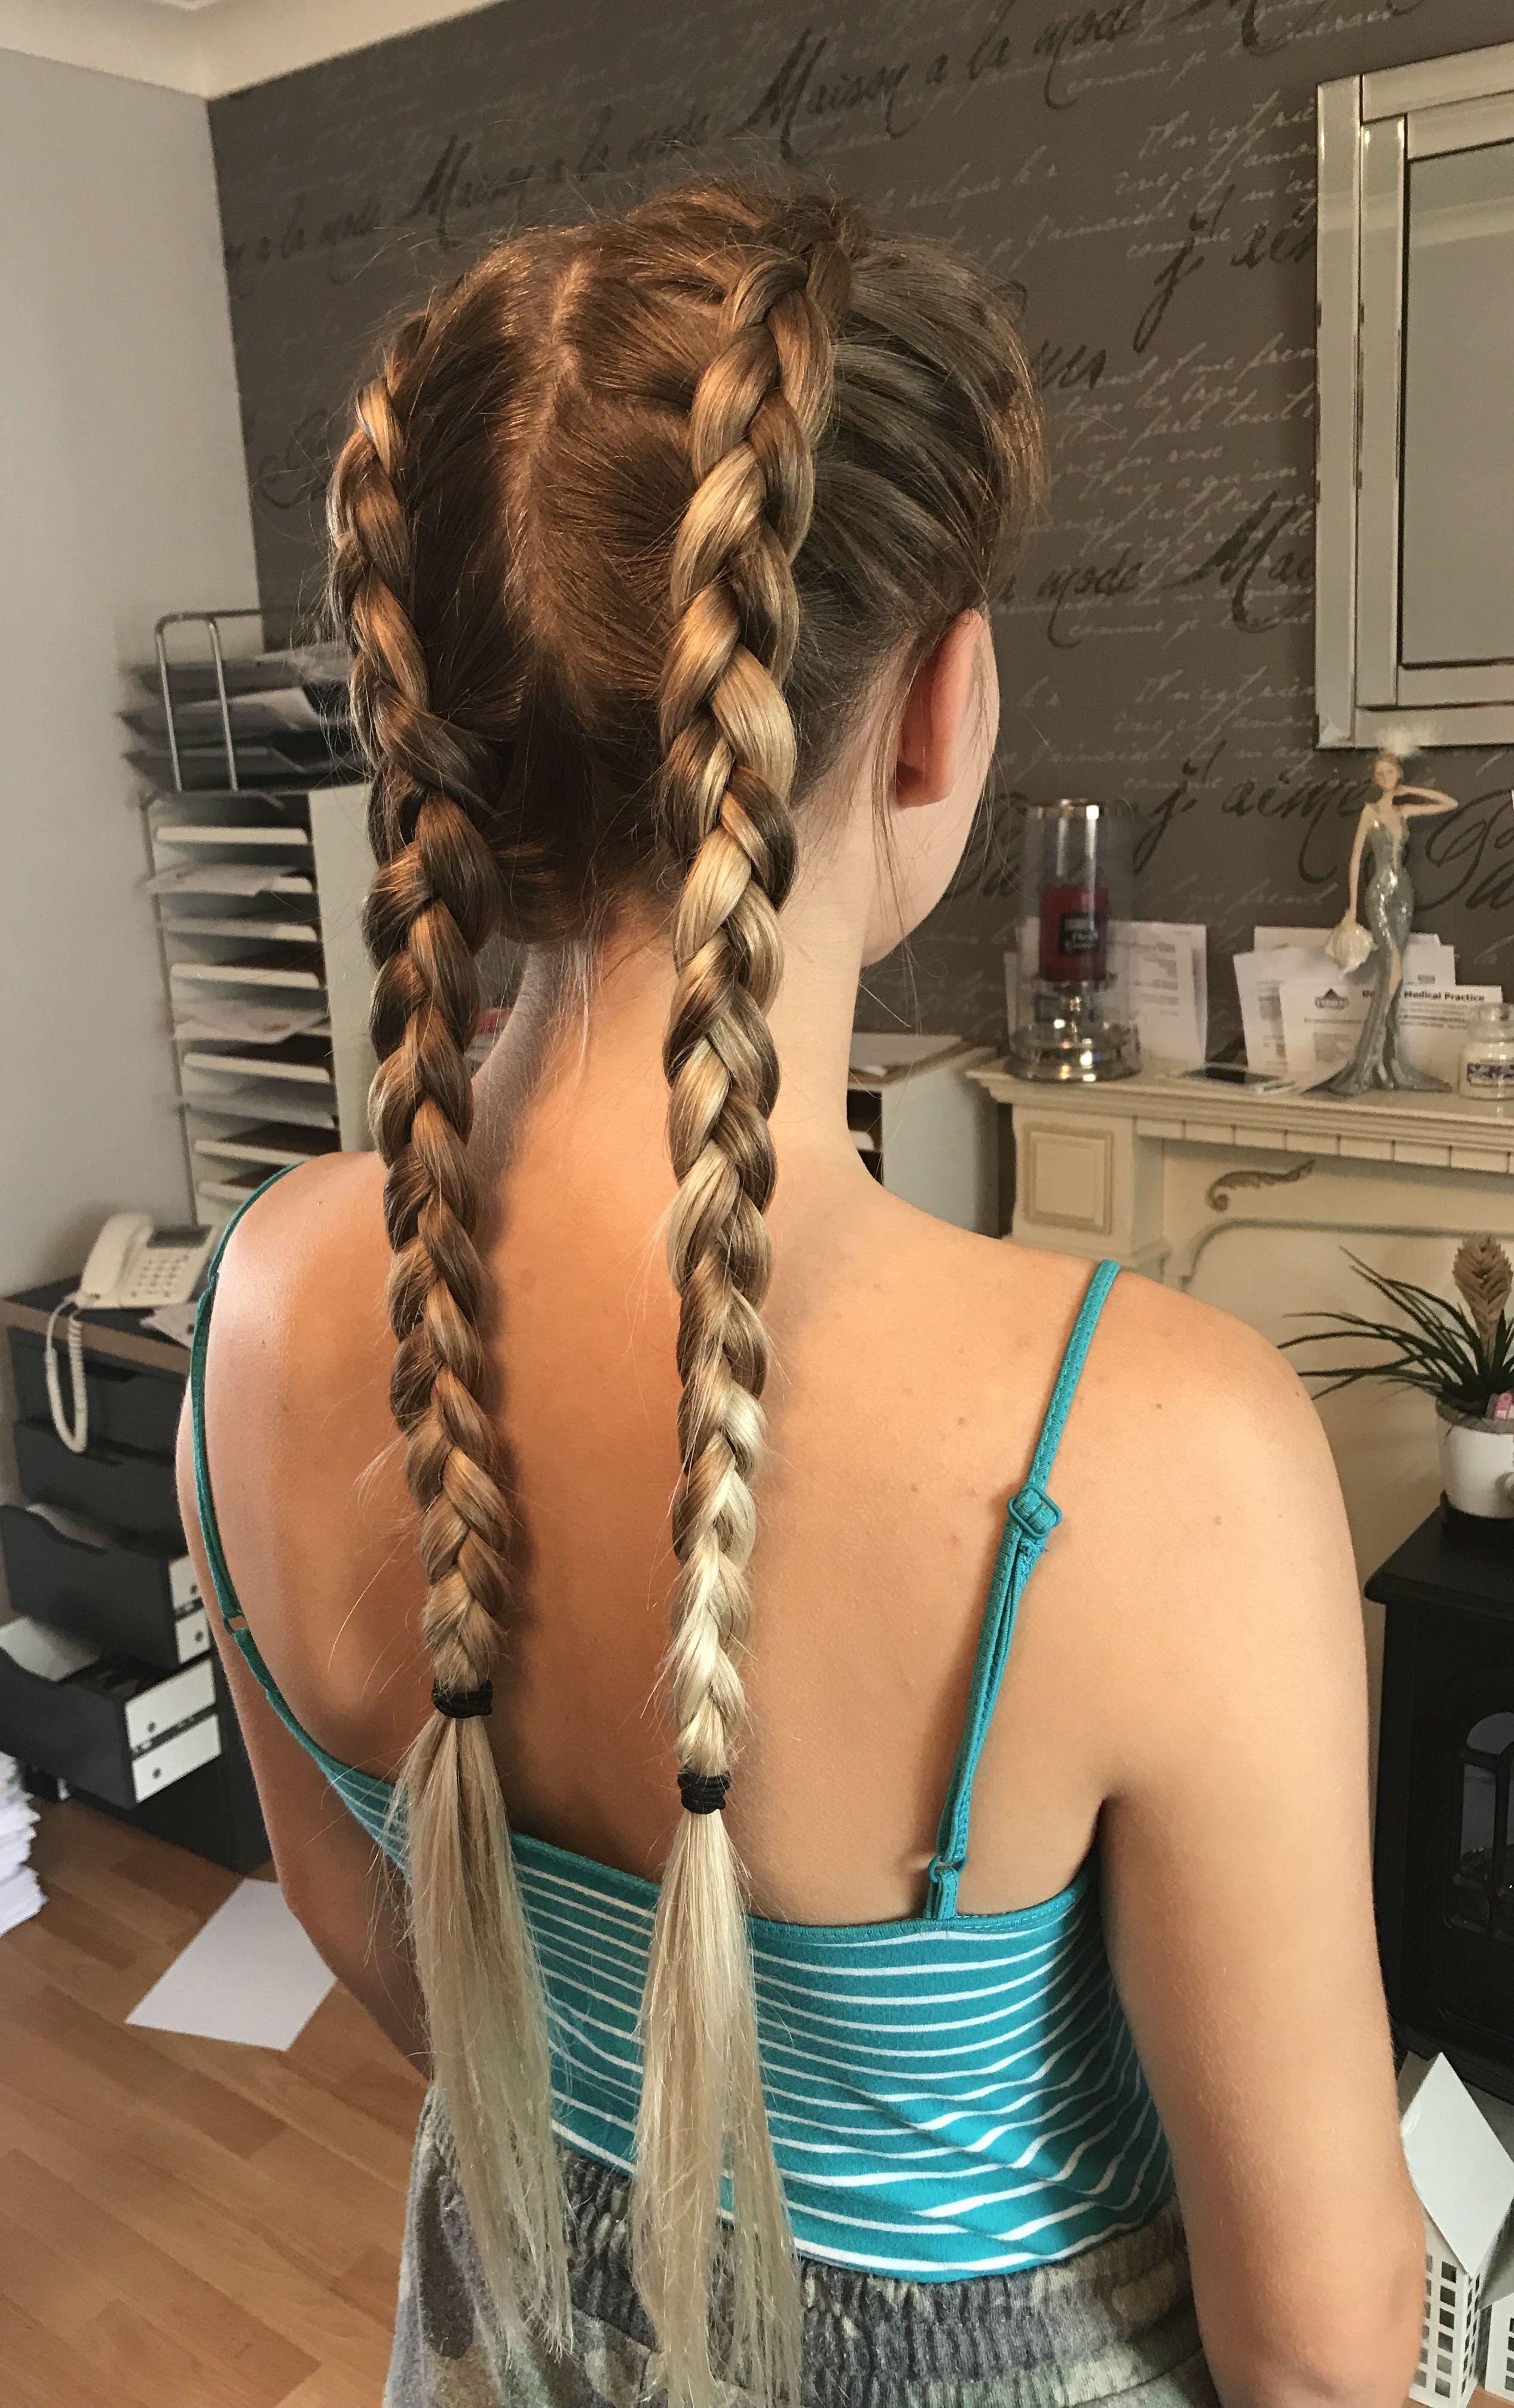 pinjayde holyhead on my hairdressing work | braided